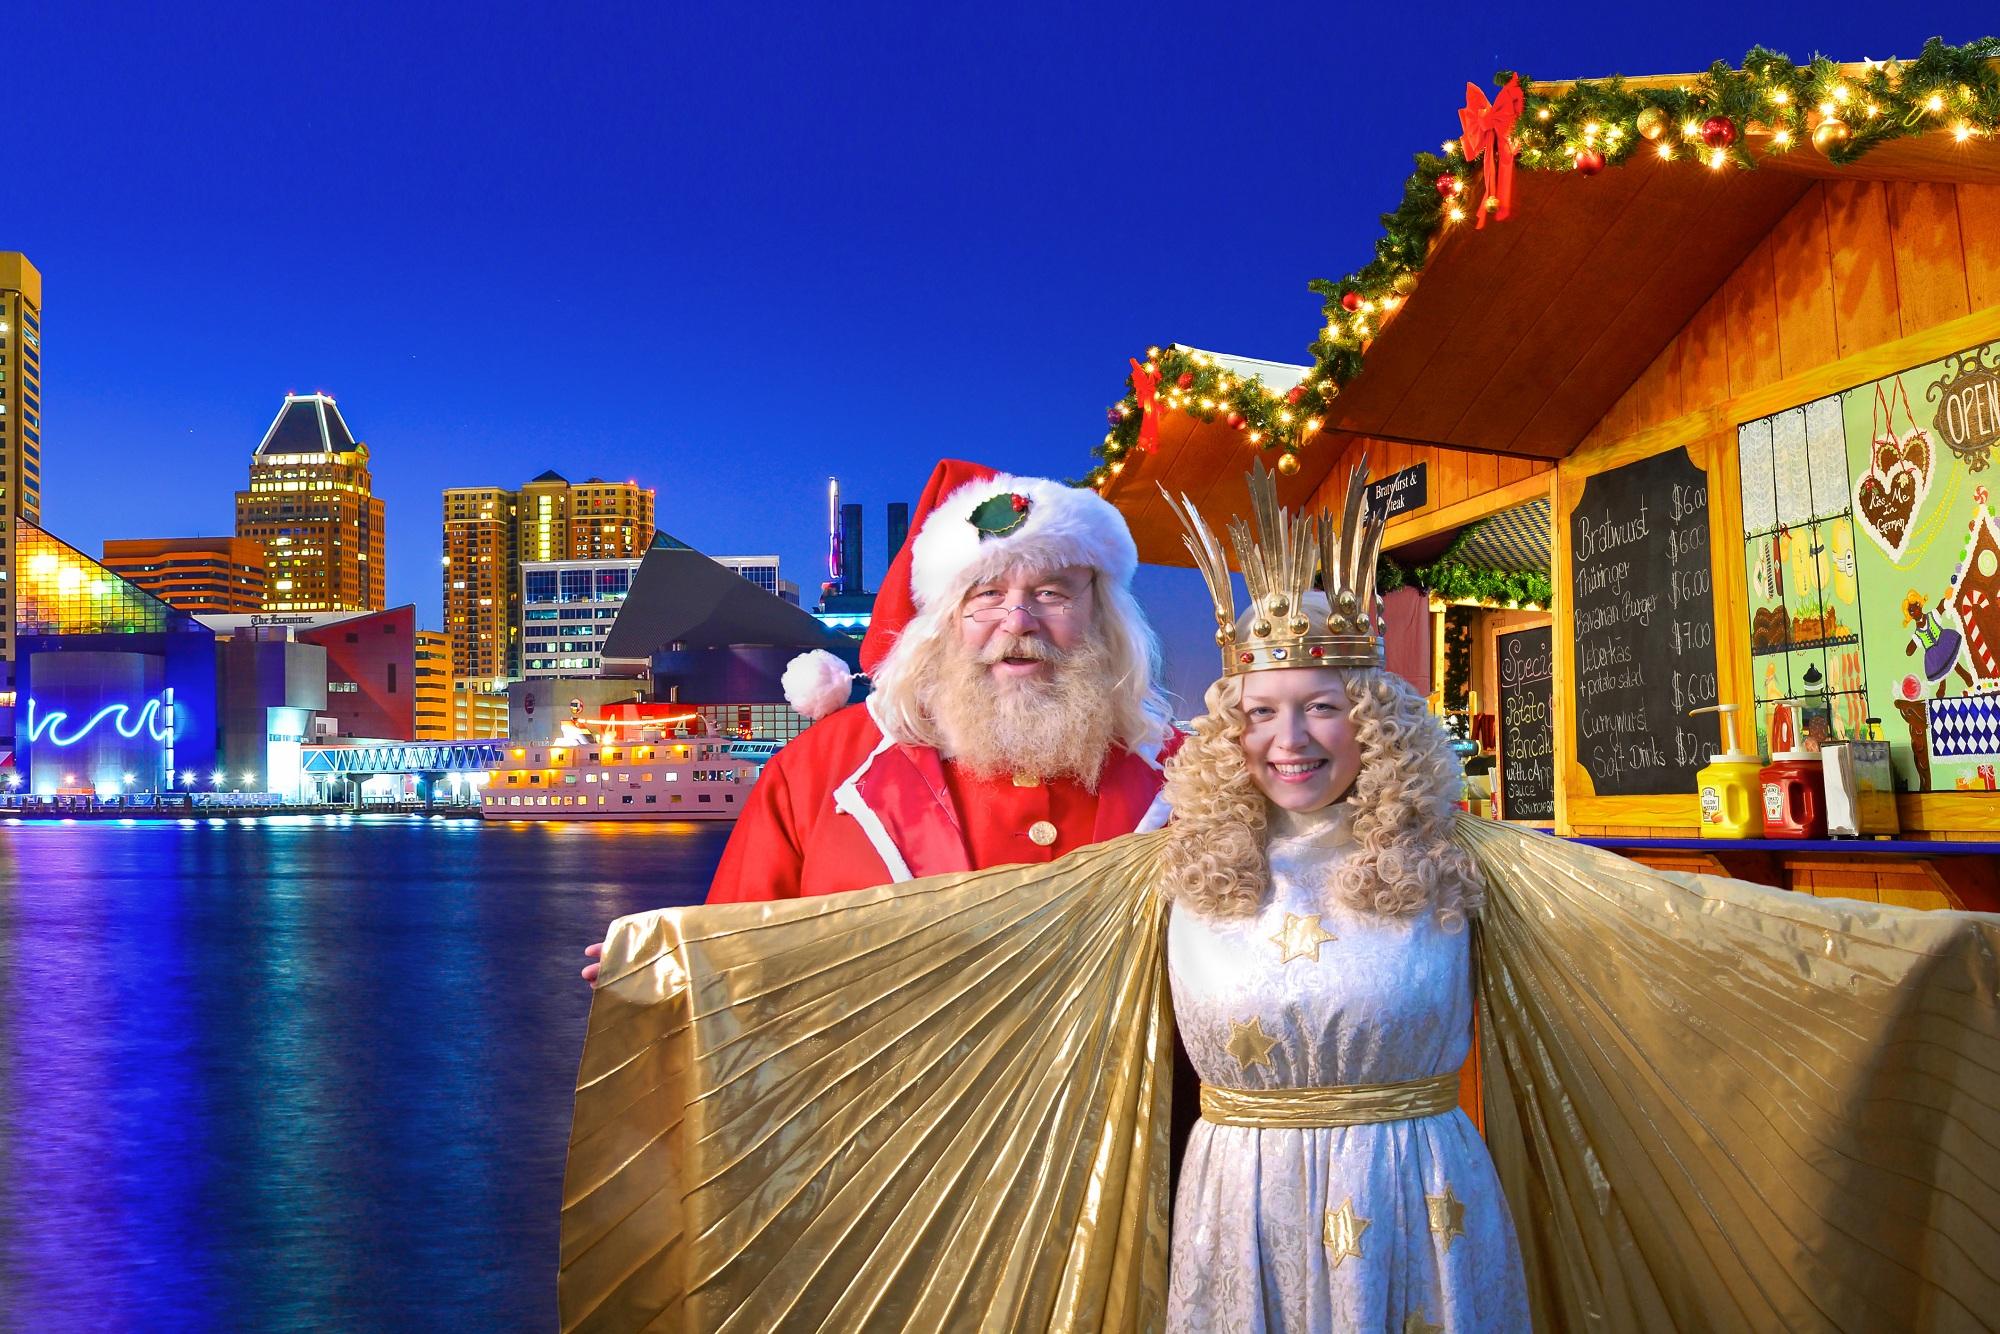 Christmas Village Baltimore, Christmas Village, German Christkind, Christmas Village Santa